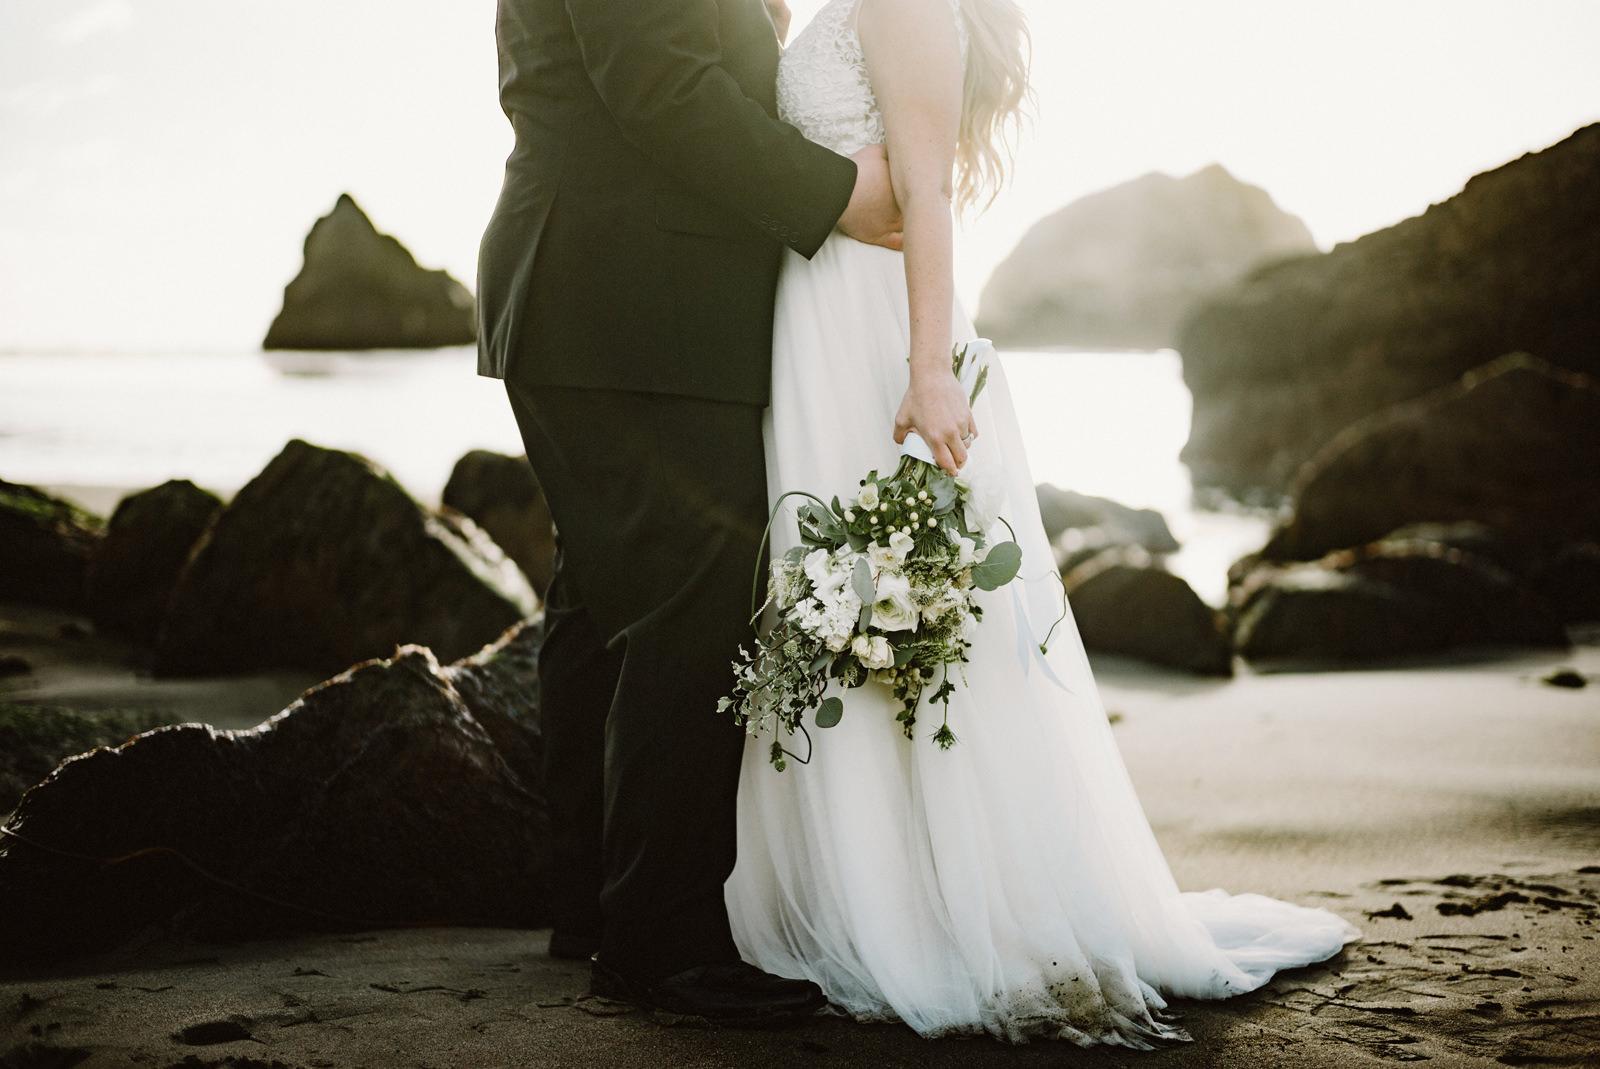 san-francisco-city-hall-elopement-55 SAN FRANCISCO CITY HALL INTIMATE WEDDING